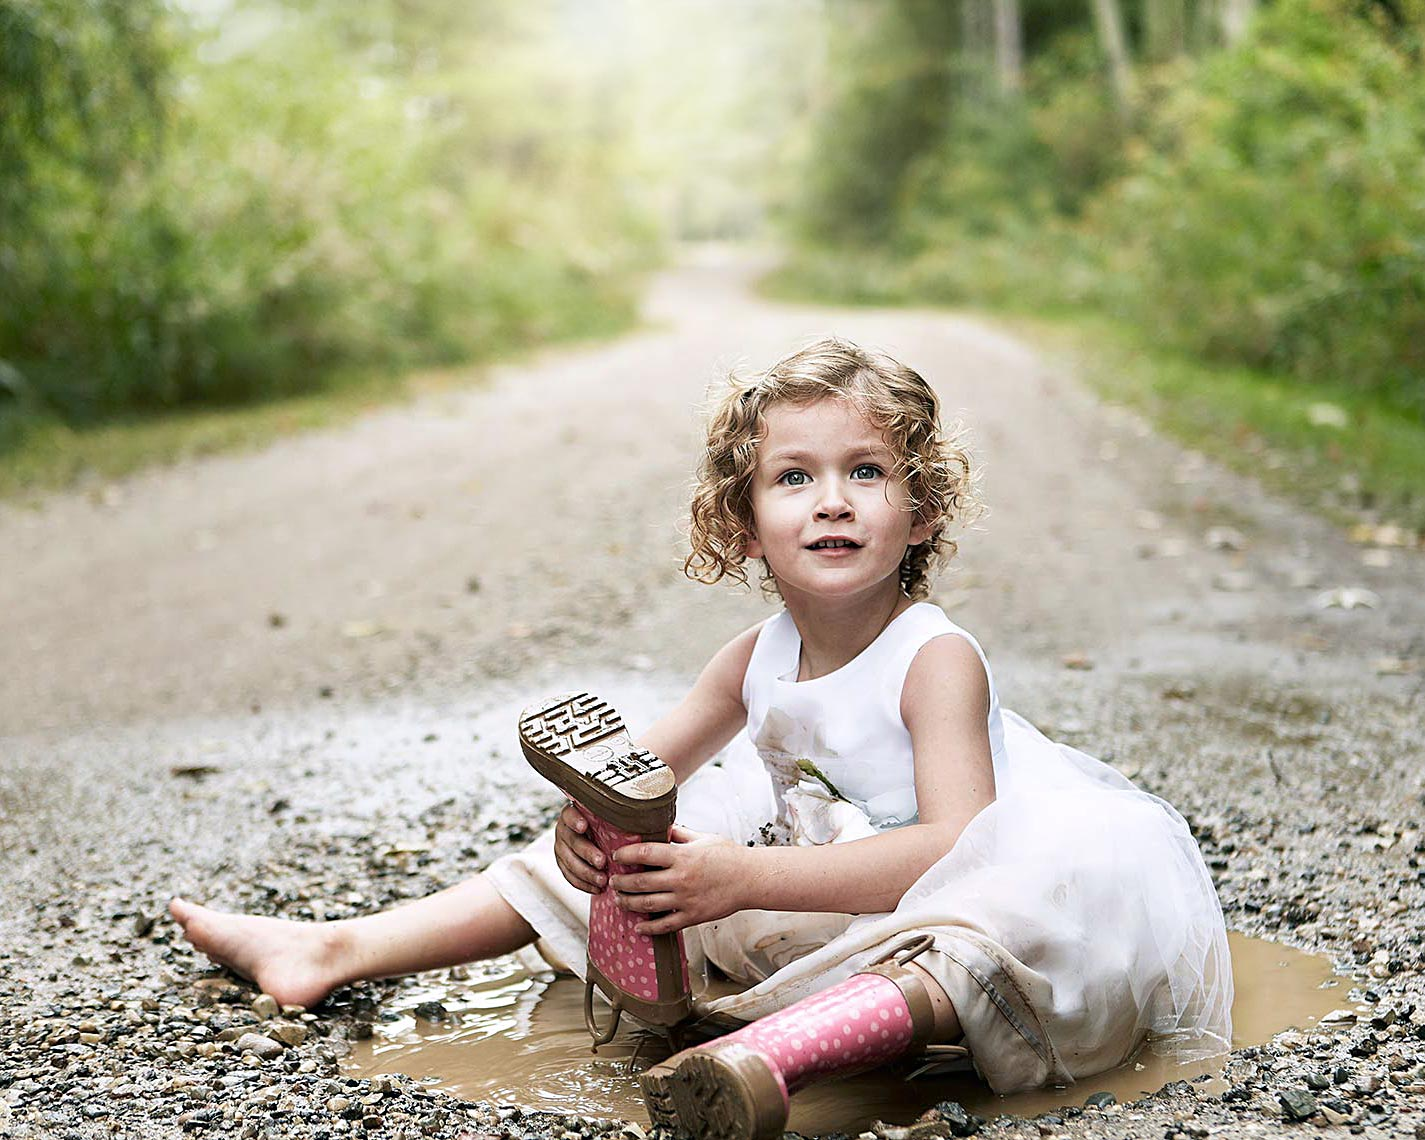 Jeremy-Frechette-Girl-MudPuddle-White-Dress.jpg